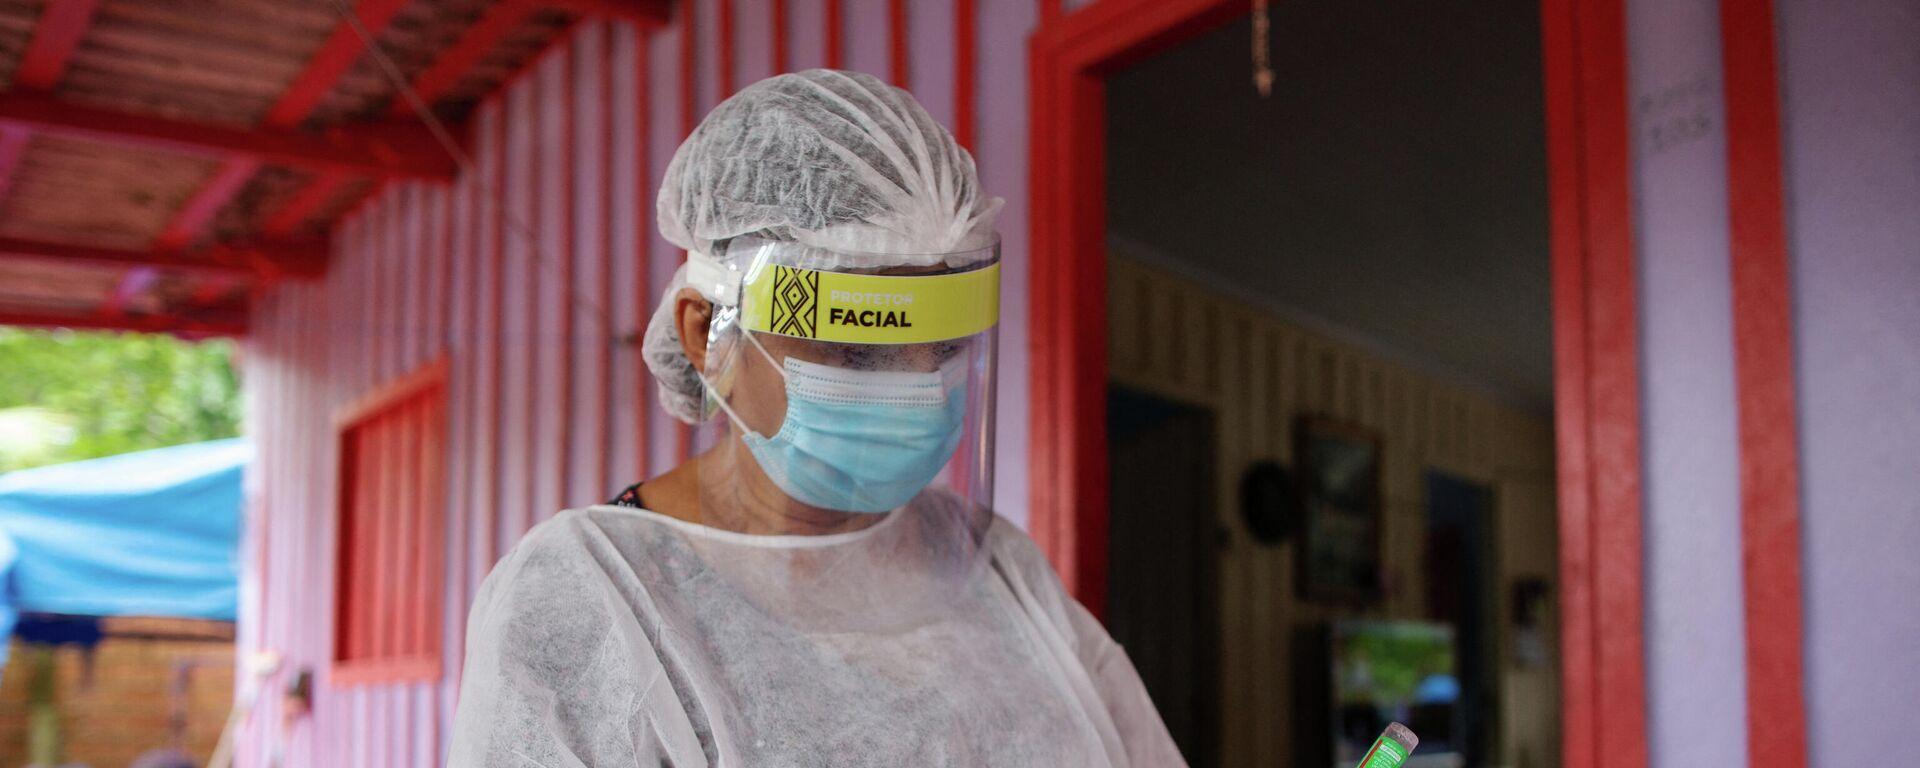 Una médica en Manaos, Brasil - Sputnik Mundo, 1920, 17.03.2021